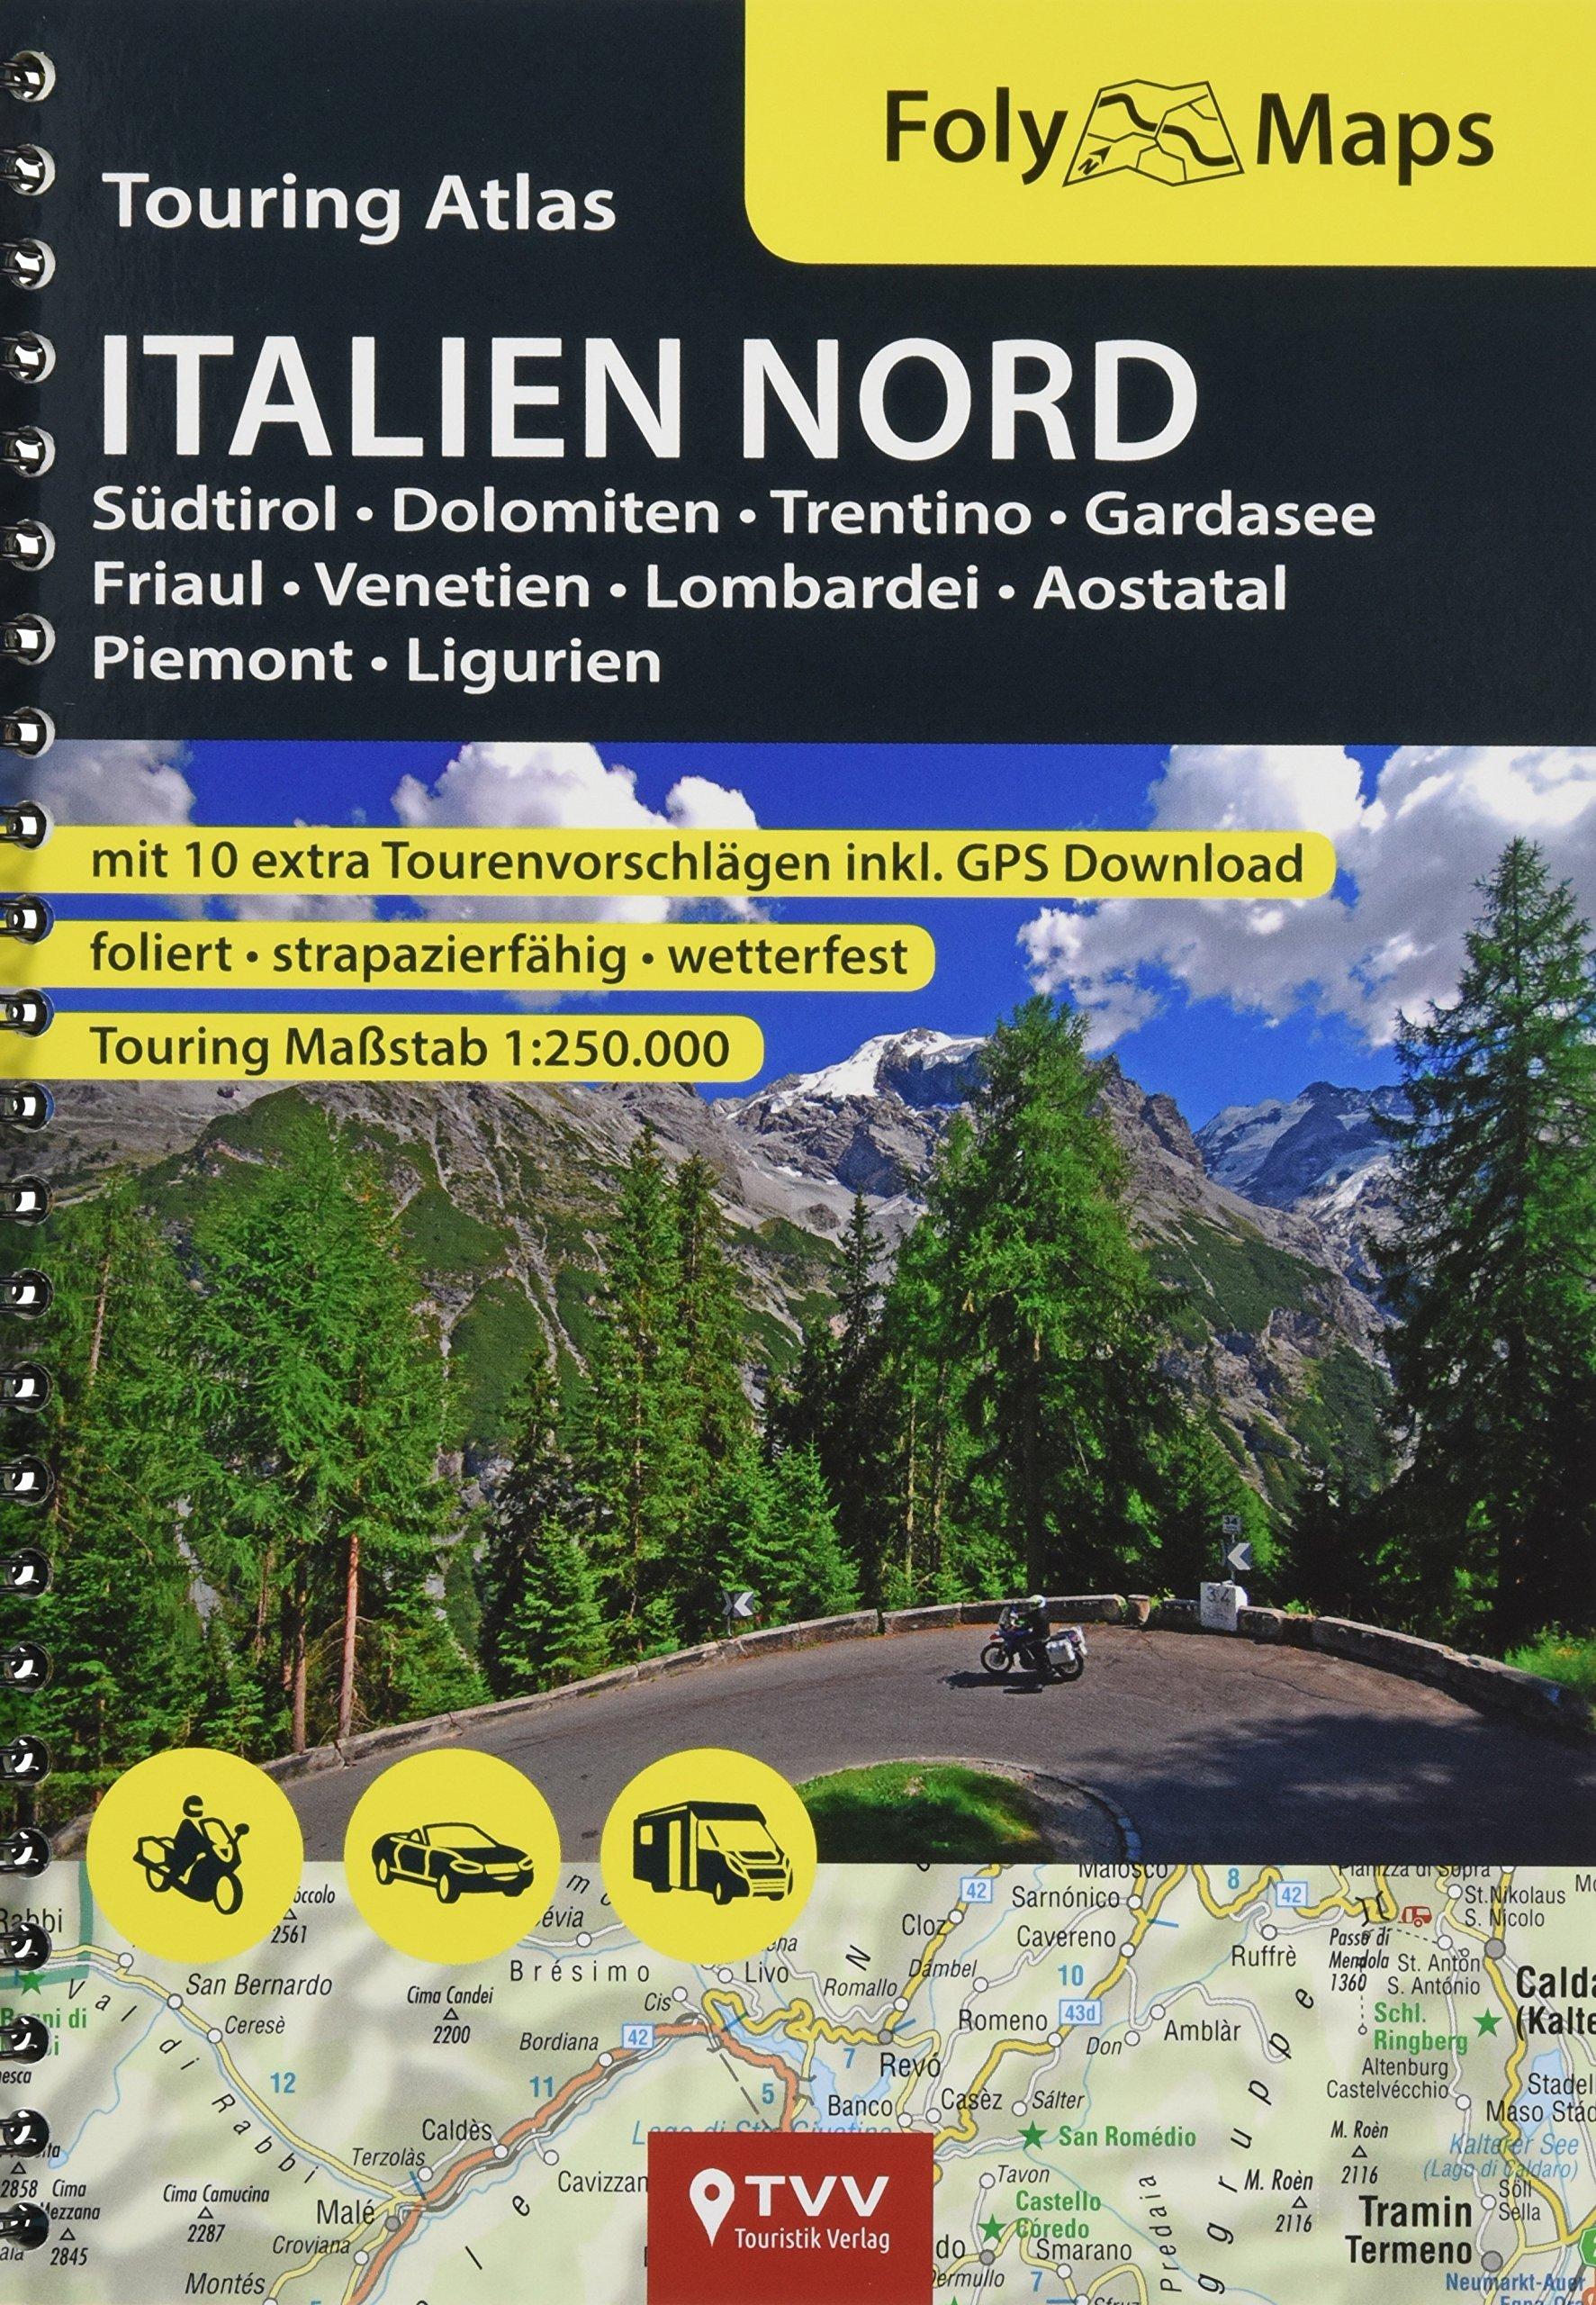 FolyMaps Touringatlas Italien Nord 1:250.000 Taschenbuch – 1. Juni 2018 TVV Touristik Verlag GmbH TVV Touristik-Verlag GmbH 3937063587 Karten / Stadtpläne / Europa